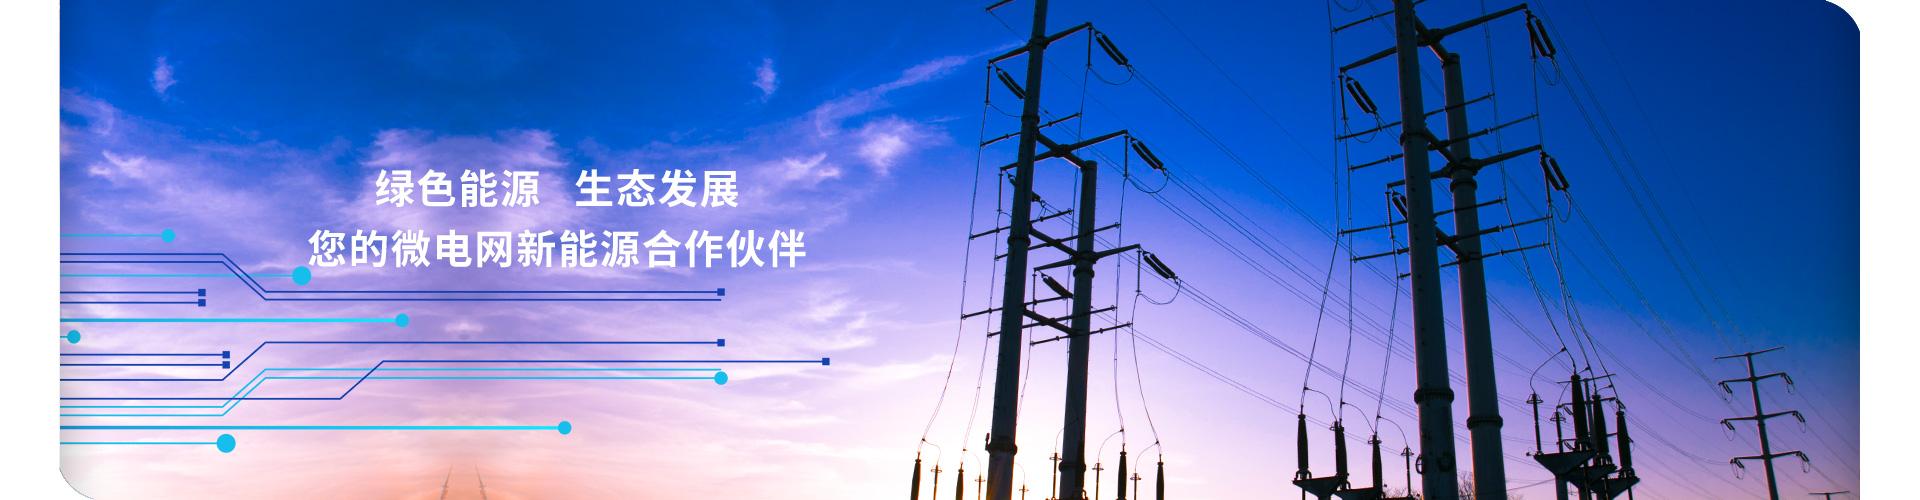 https://www.yutee.cn/data/upload/202008/20200815144634_996.jpg